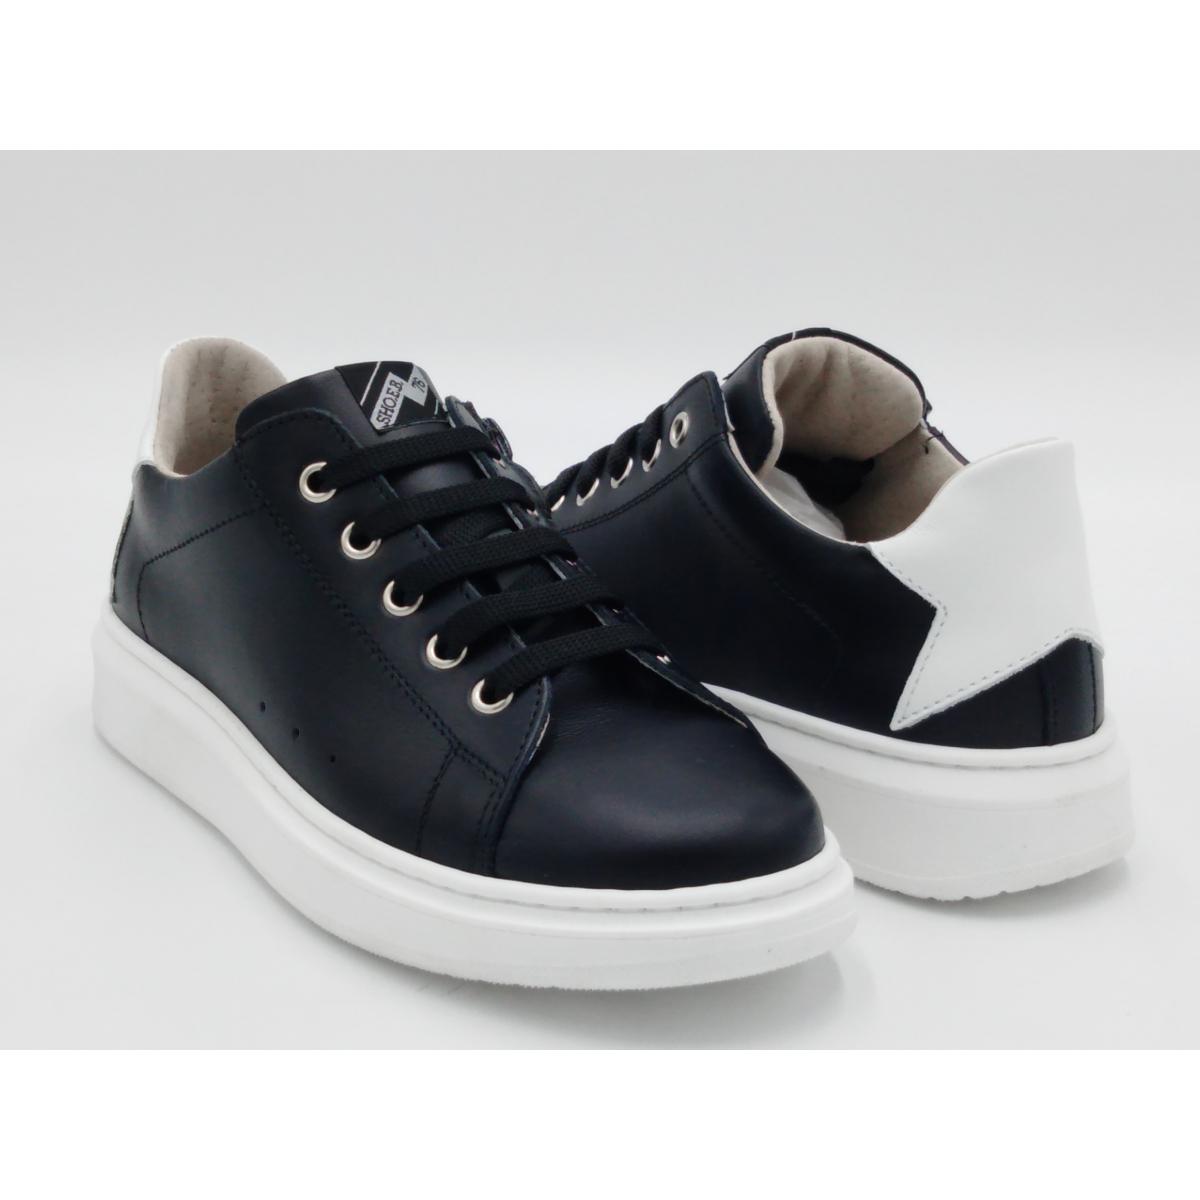 SHOEB 76 Sneaker nera lacci